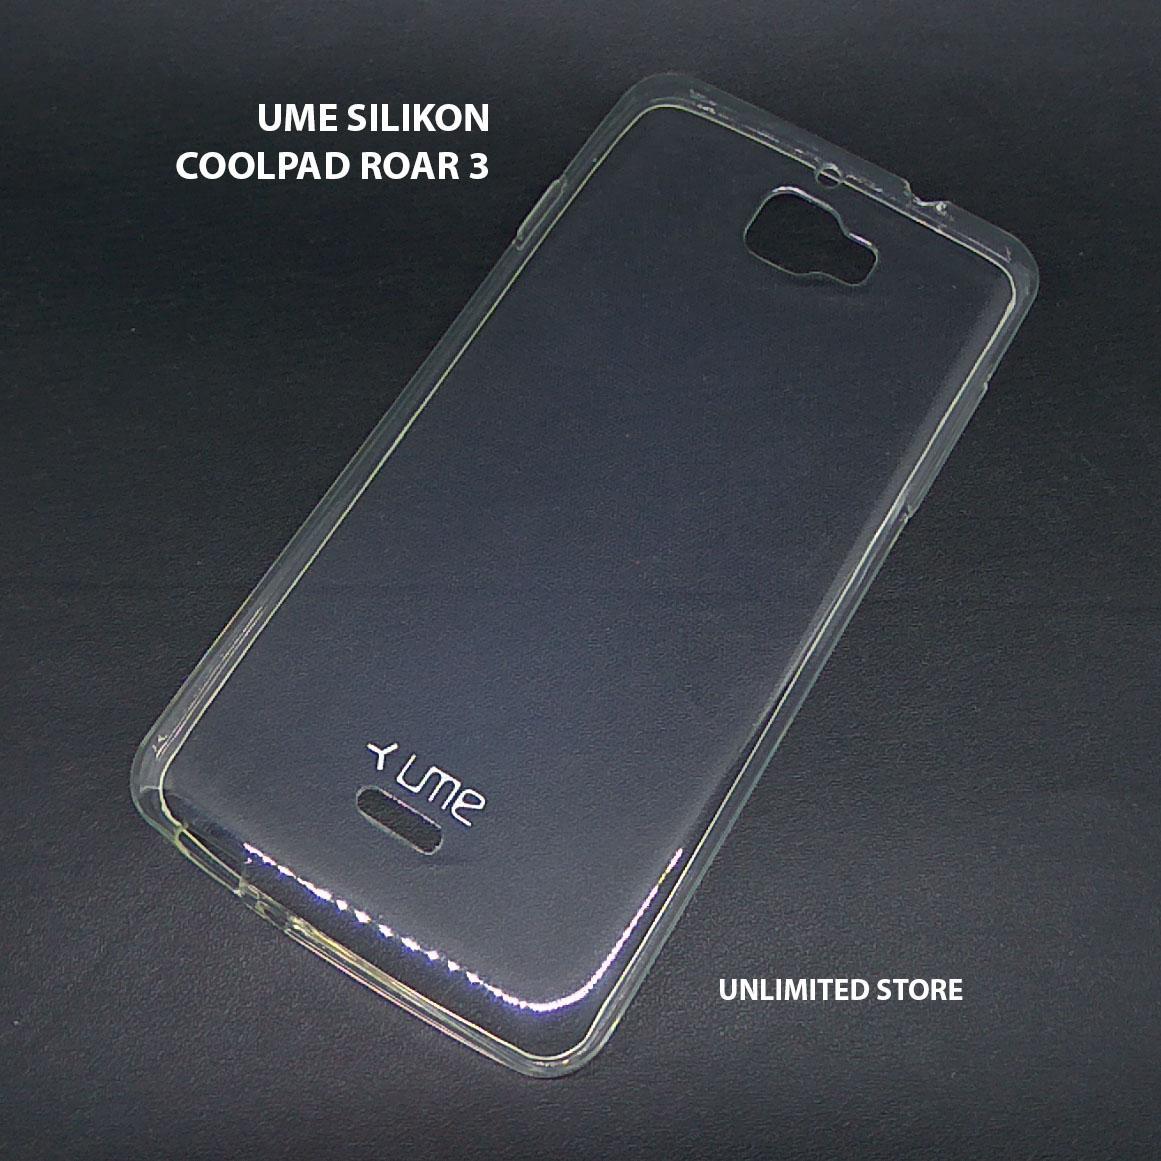 Ultrathin Softcase UME TPU Coolpad Roar 3 A118 Casing Ultra thin Soft case Silikon Silicone